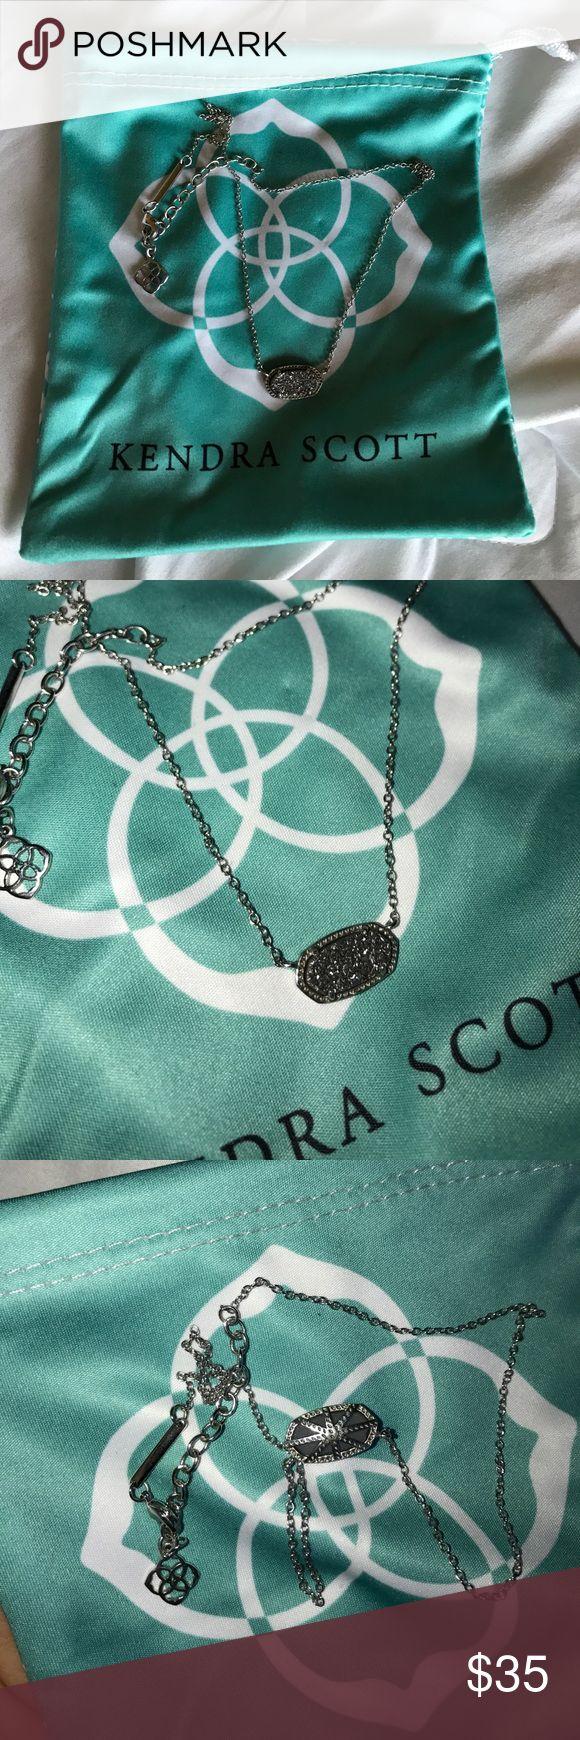 Kendra Scott Druzy Neckless Perfect condition!! Kendra Scott Jewelry Necklaces